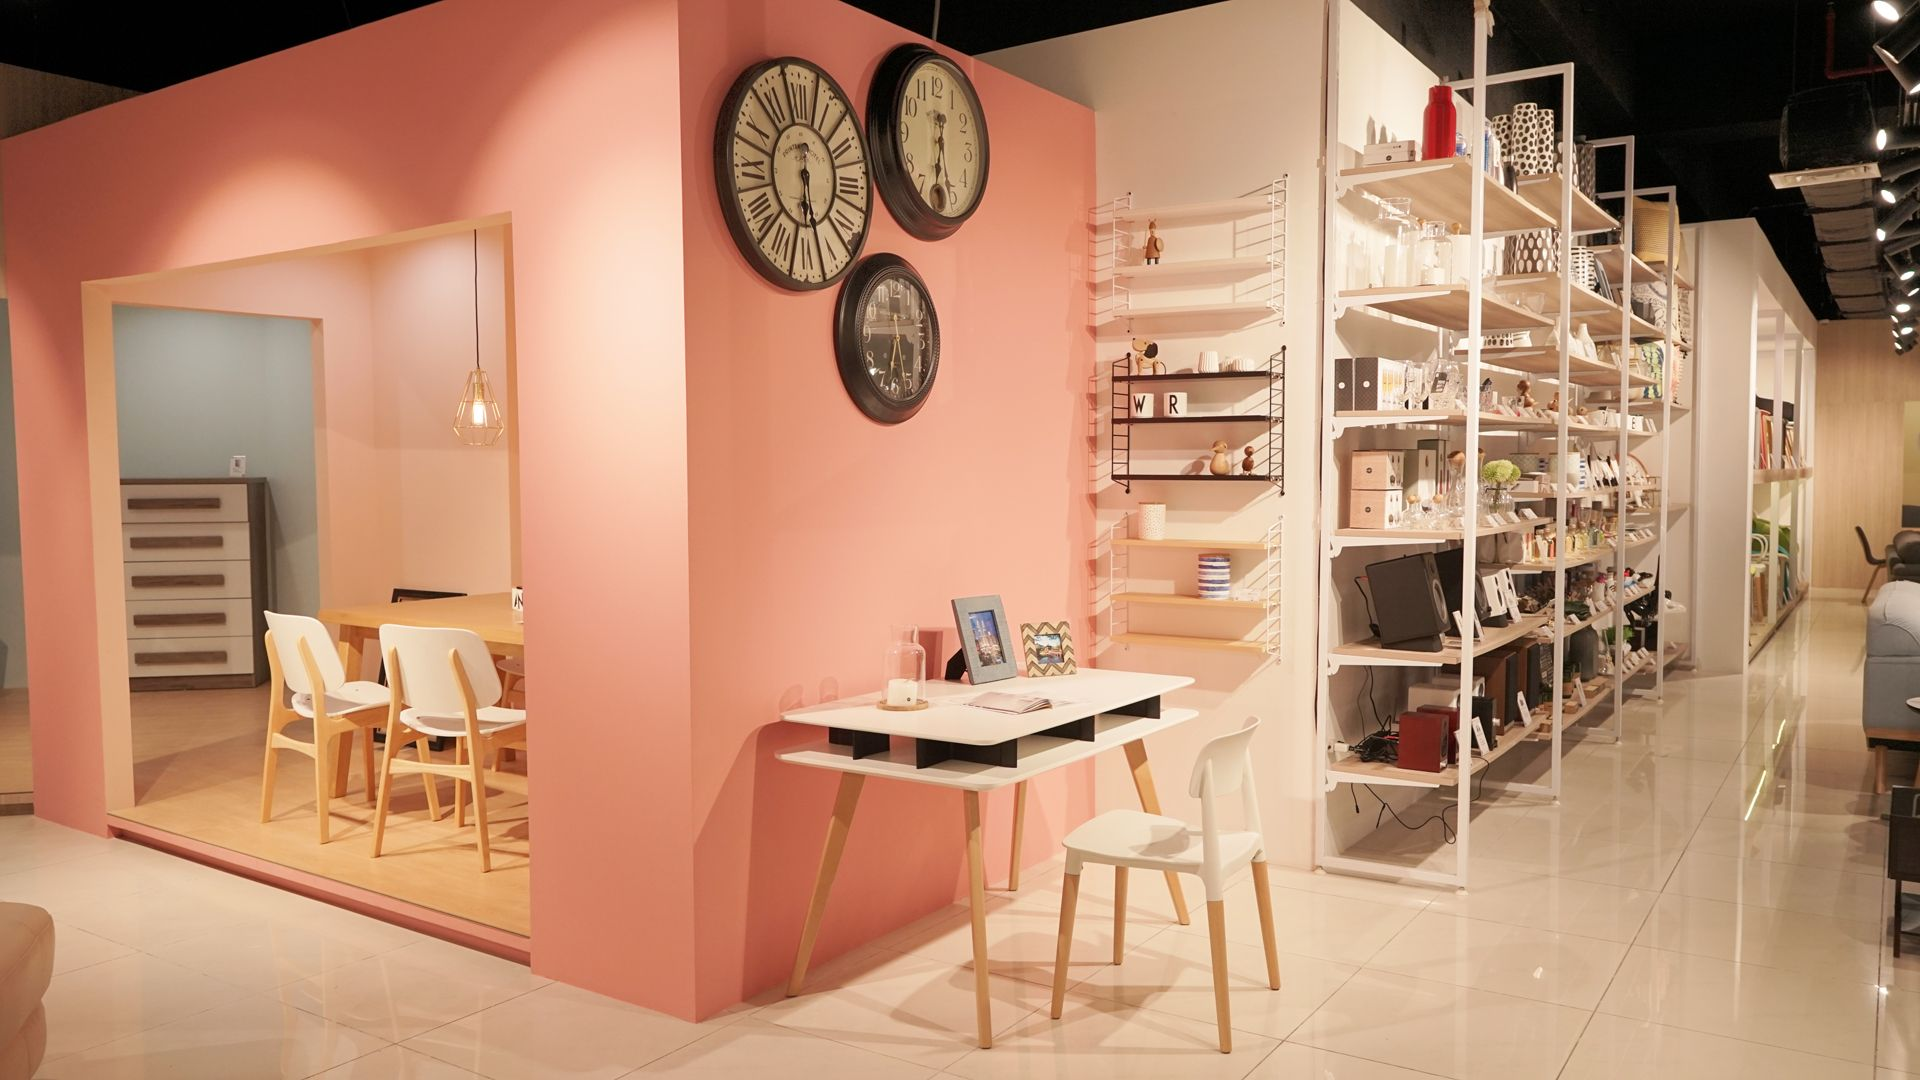 New In Town: Dezeenio Opens First Store in Makati